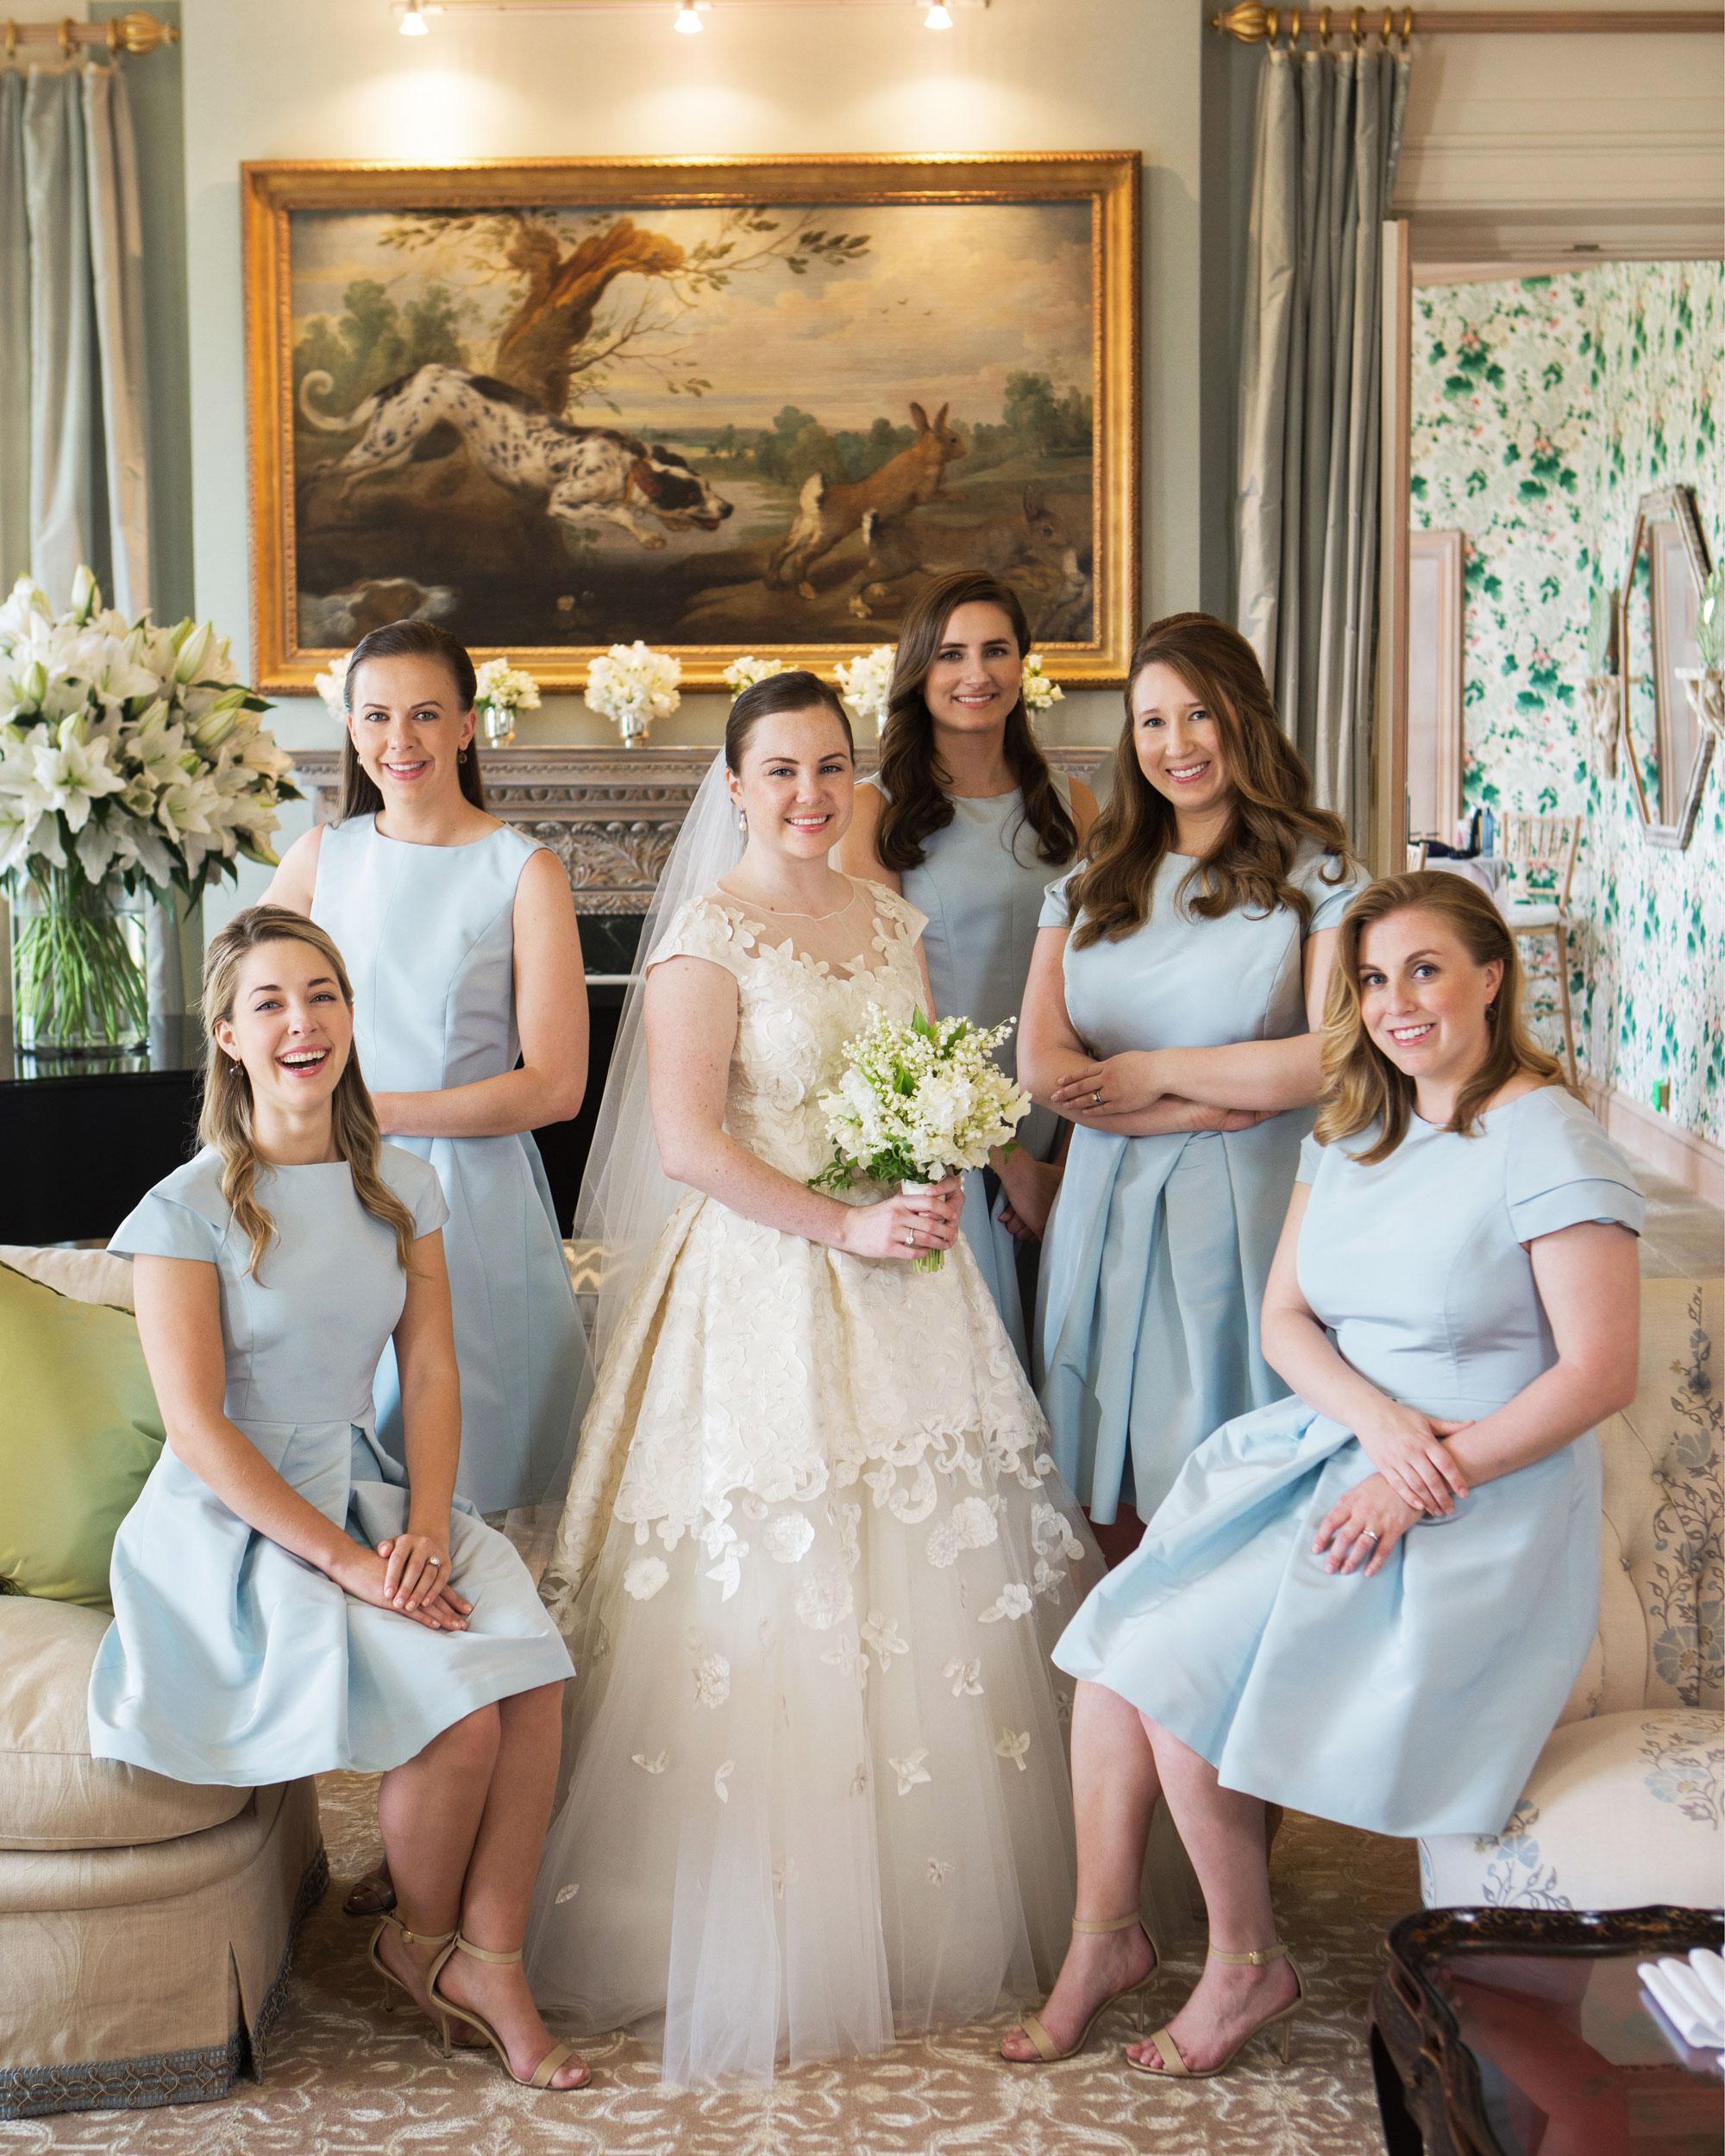 emily-matthew-wedding-bridesmaids-0032-s112720-0316.jpg